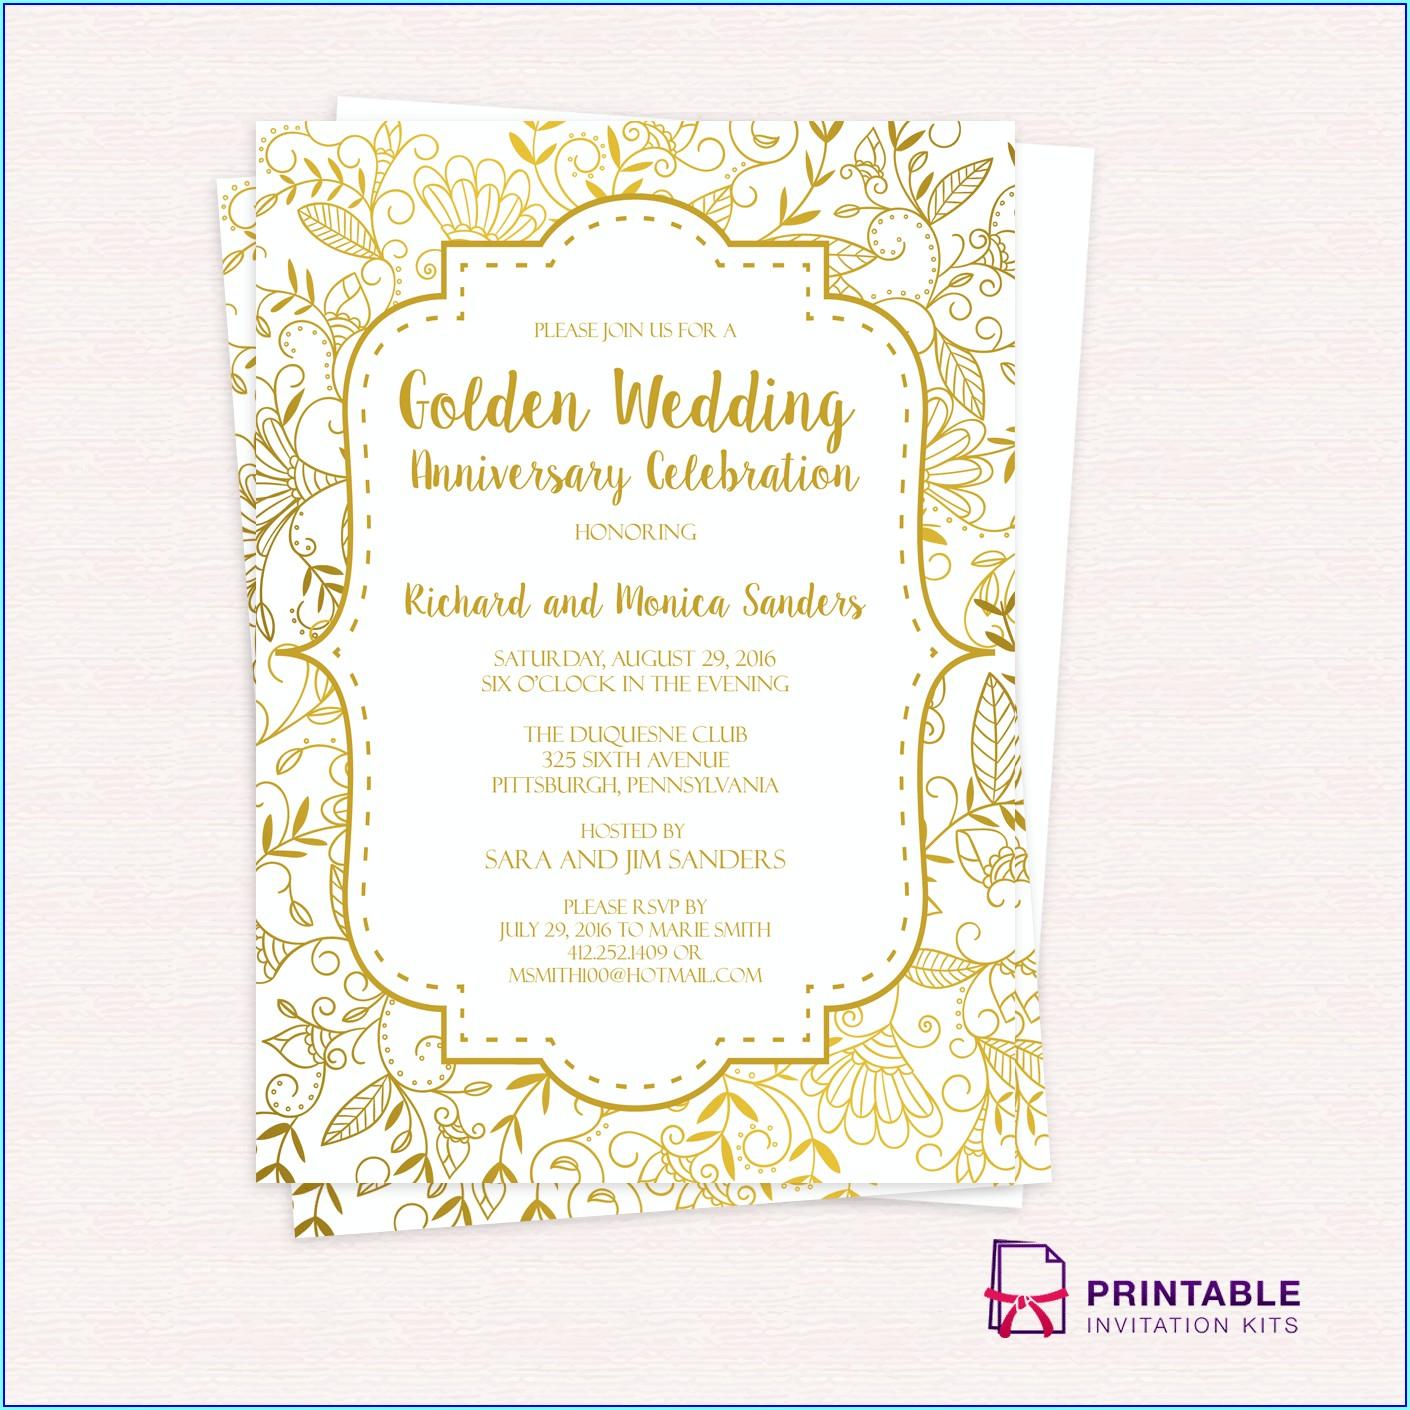 Downloadable Disney Wedding Invitation Templates